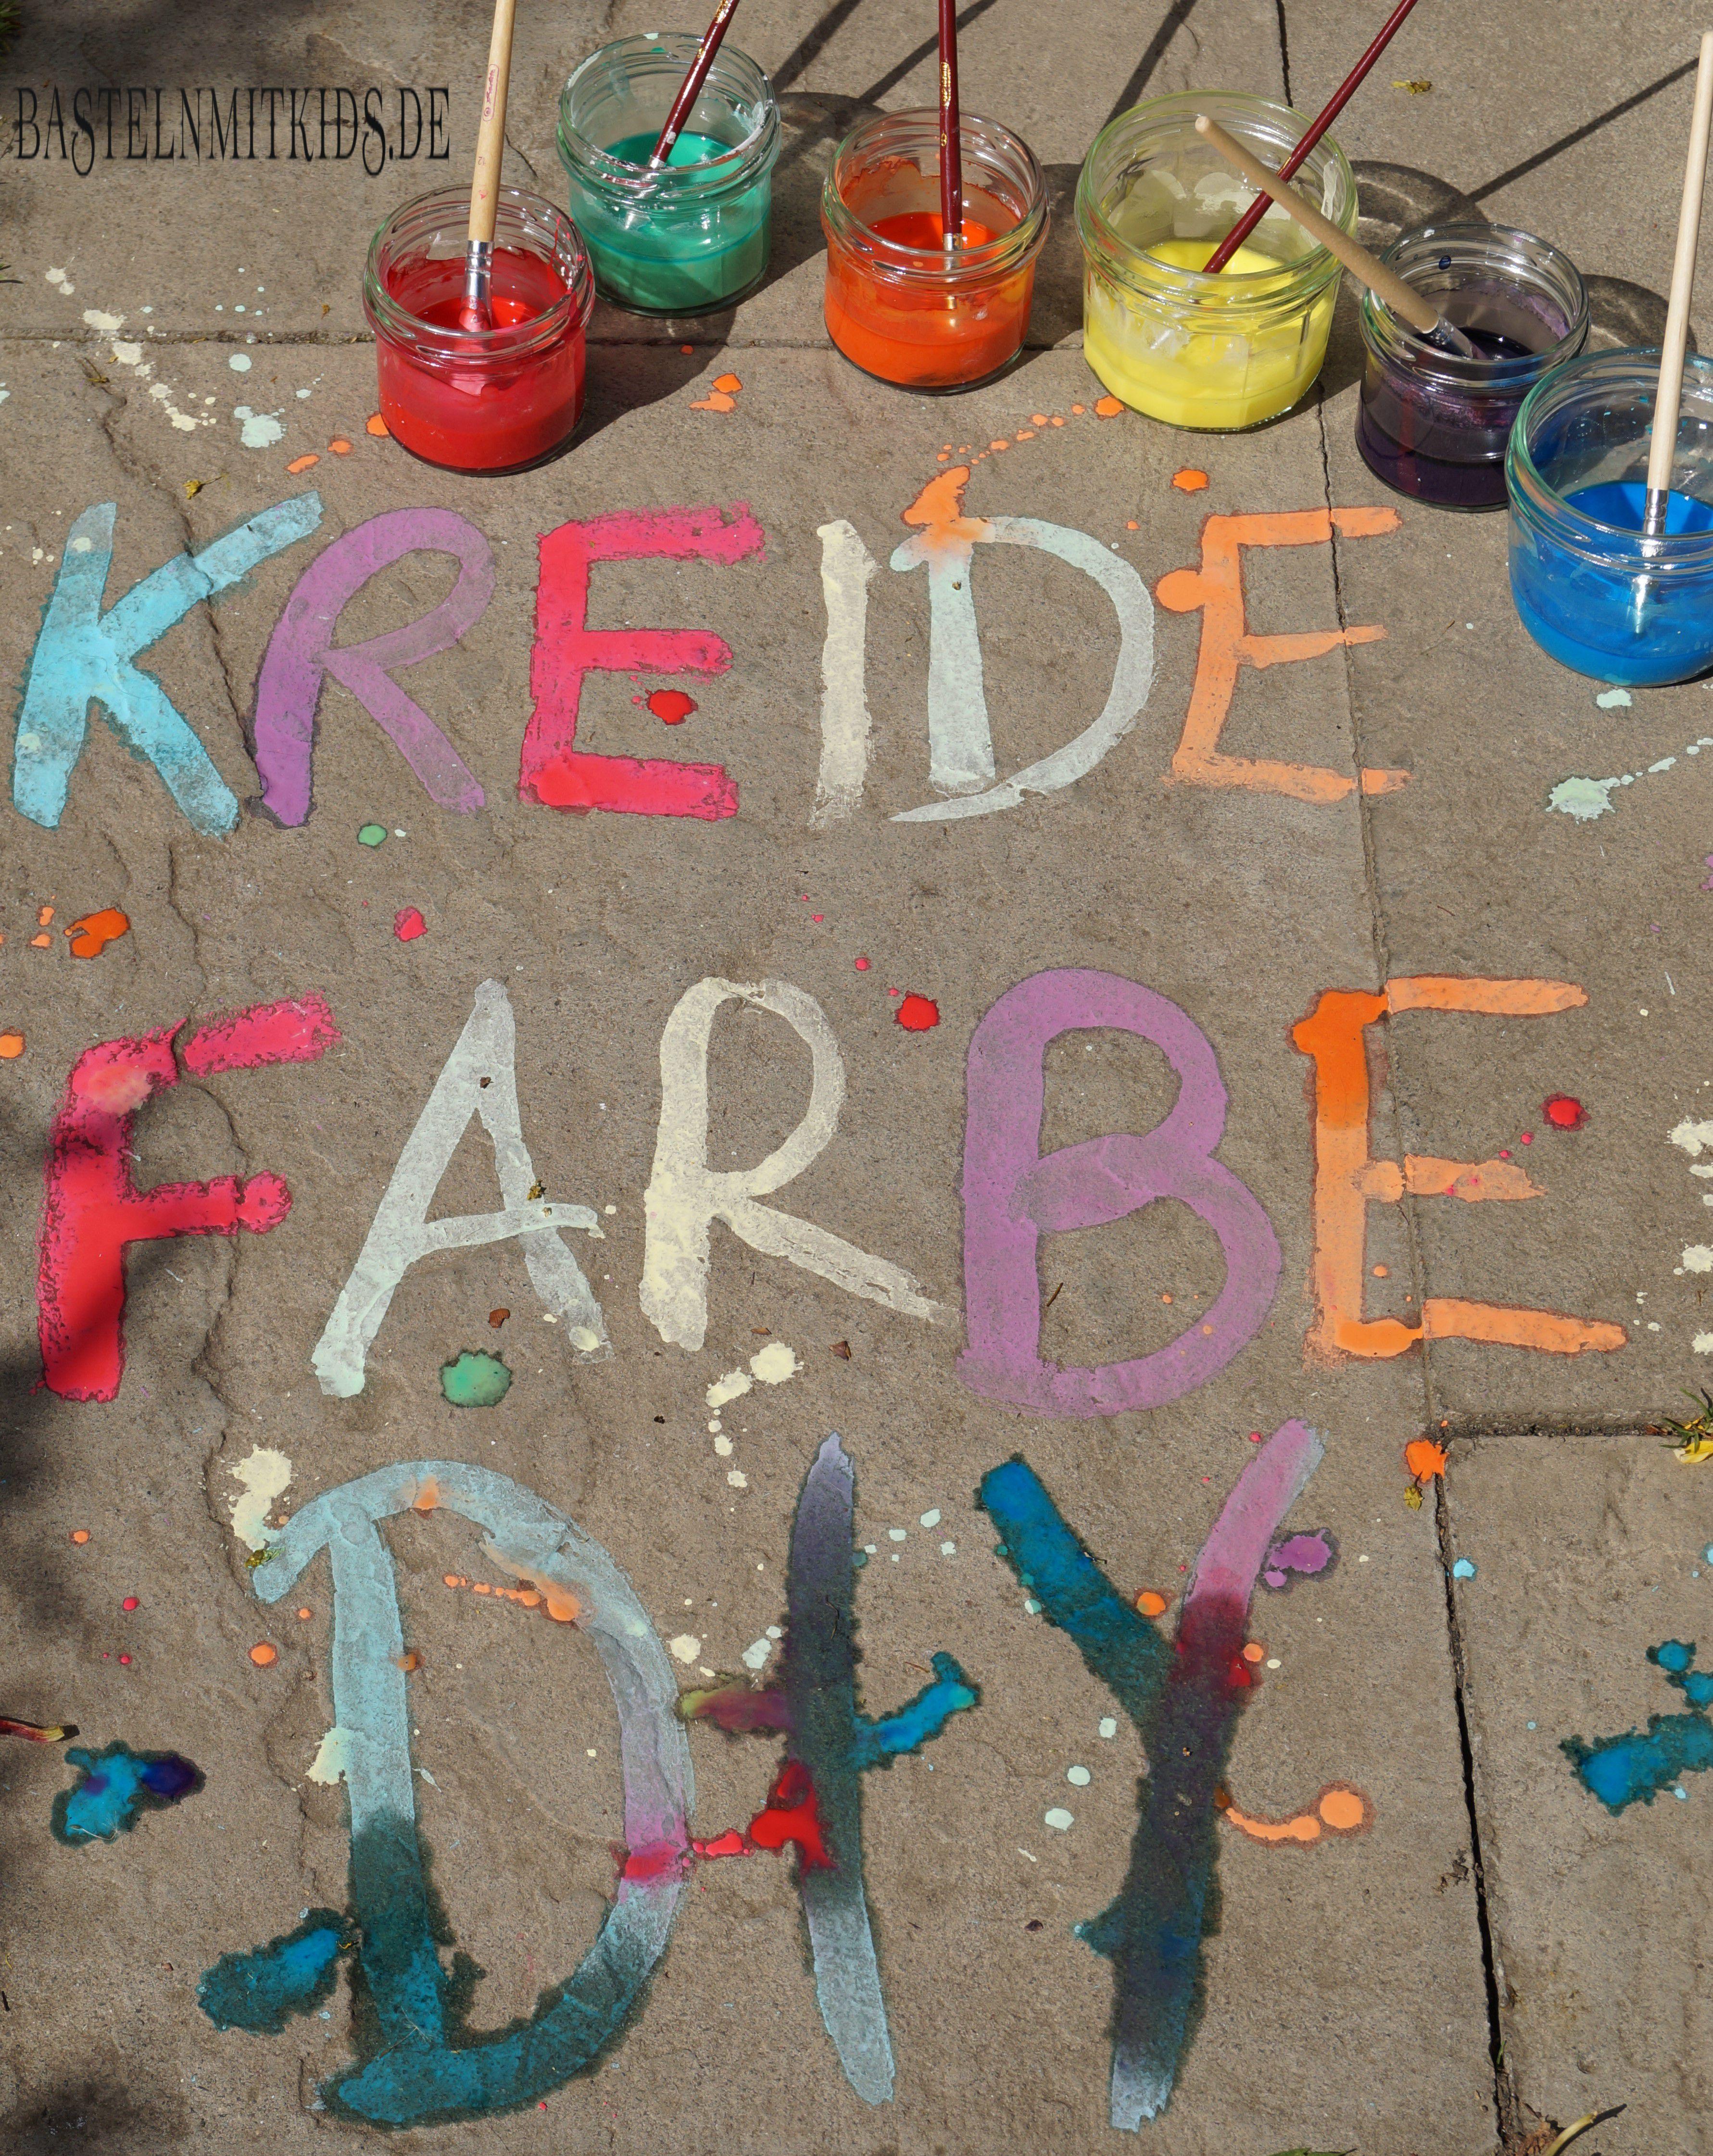 kreidefarbe selber machen kindergarten crafting recipes. Black Bedroom Furniture Sets. Home Design Ideas